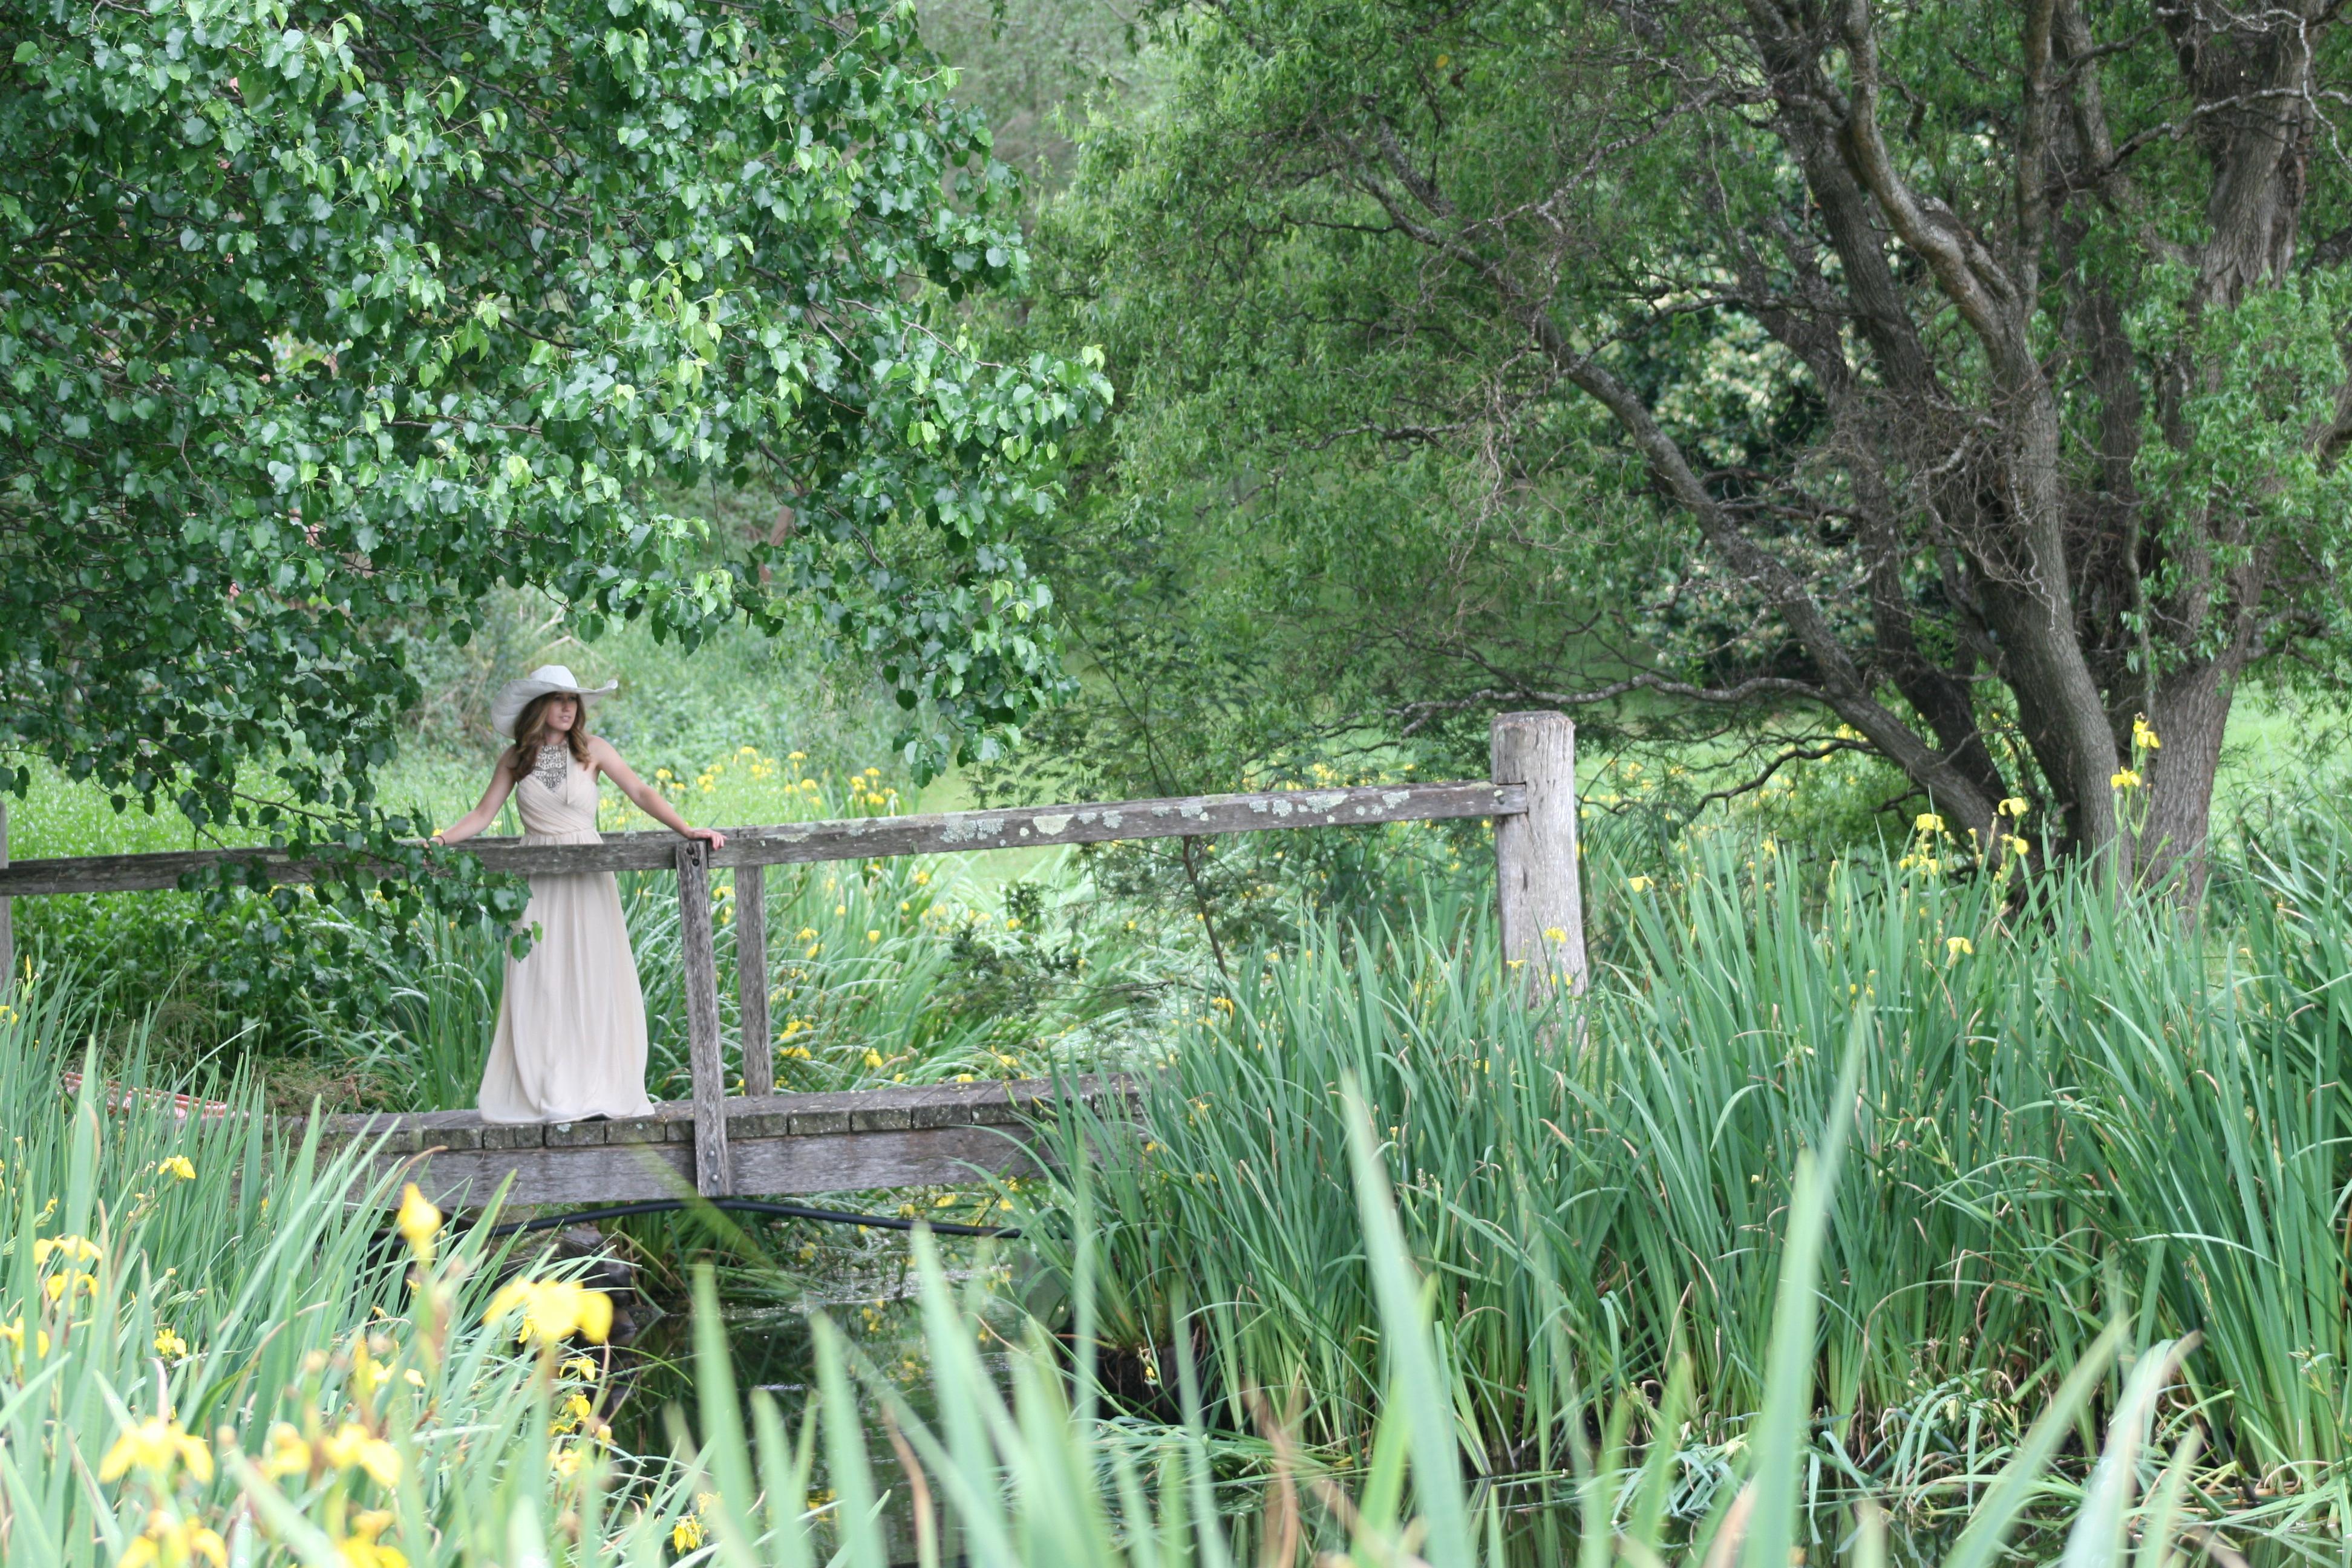 A Wedding for the Widower Brush Creek Brides Book 1